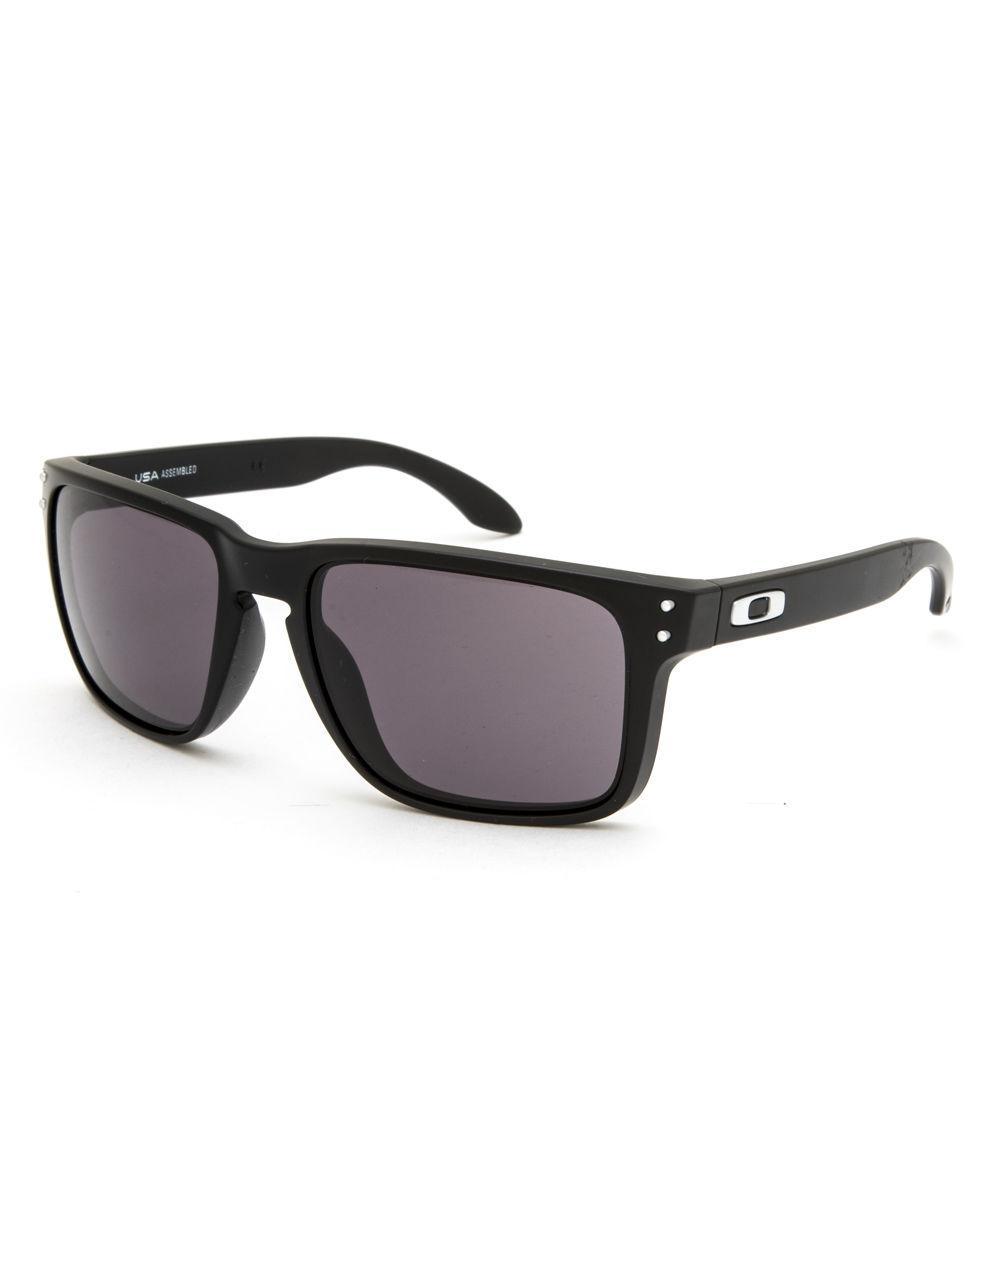 d50f55a4be Lyst - Oakley Holbrook Xl Matte Black   Warm Gray Sunglasses in ...